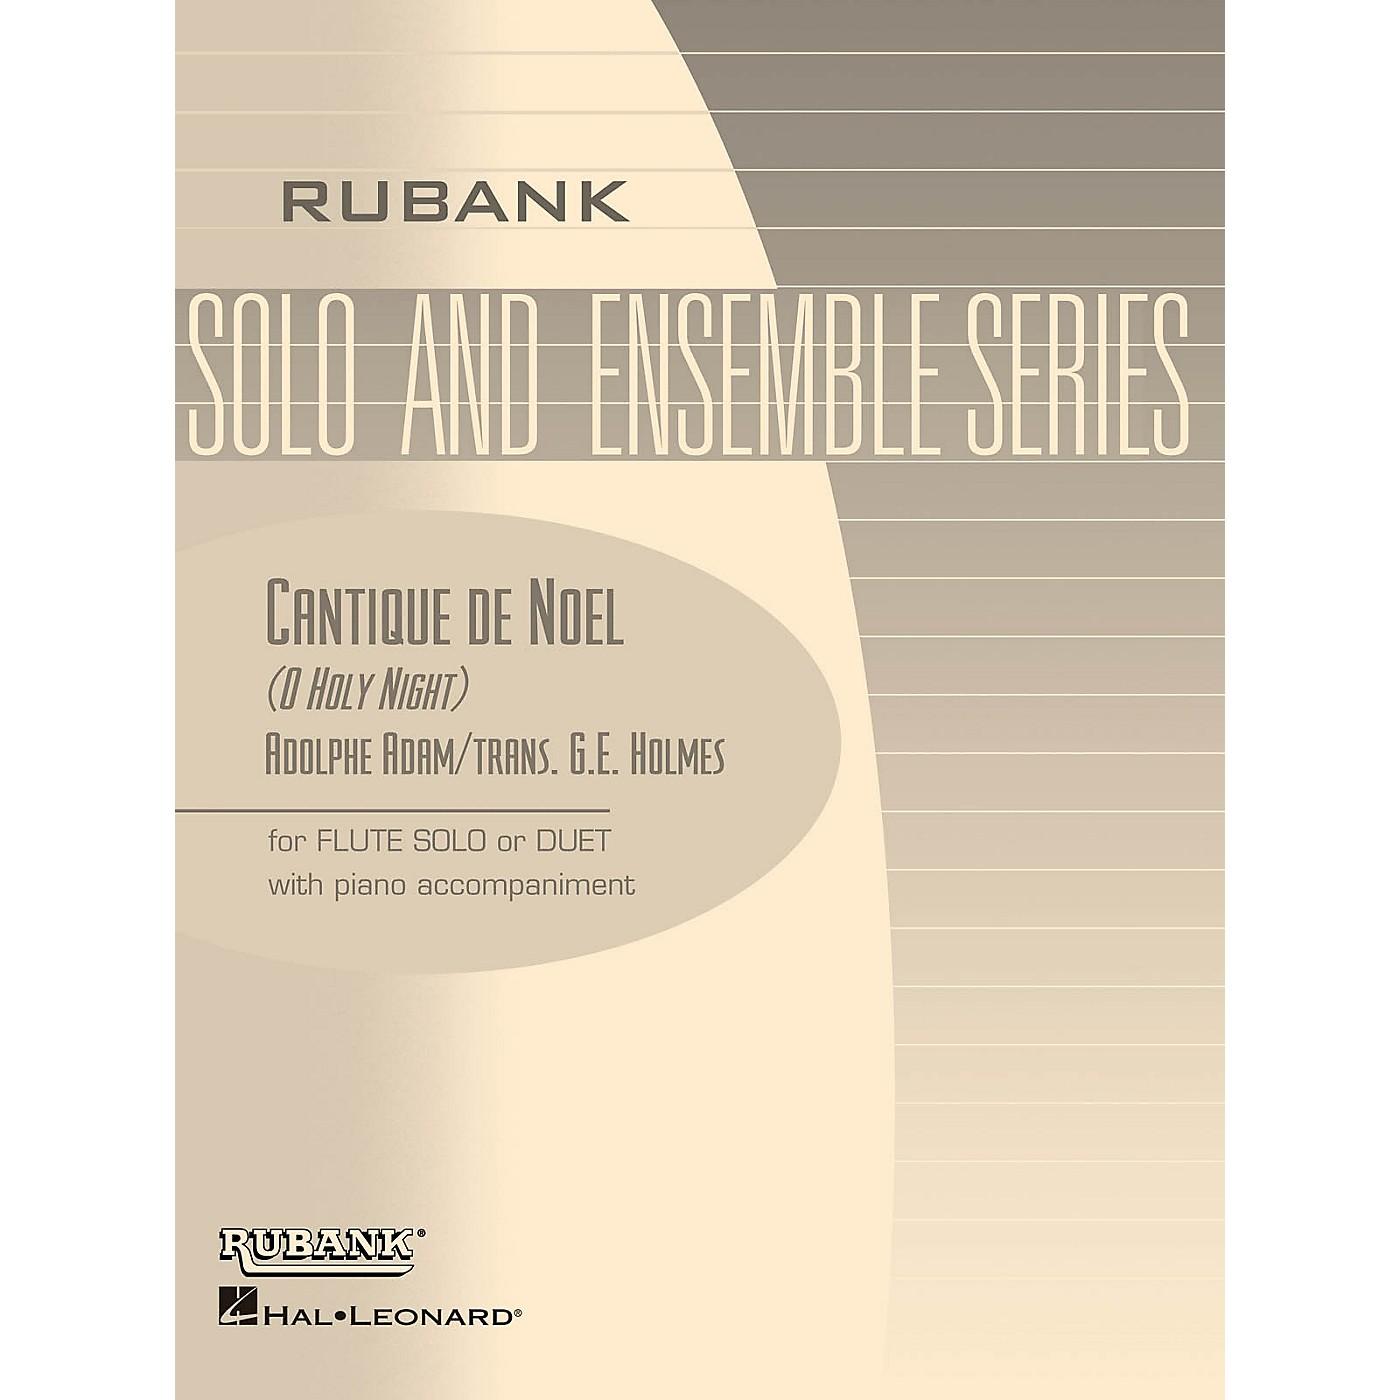 Rubank Publications Cantique de Noël (O Holy Night) Rubank Solo/Ensemble Sheet Series Arranged by G.E. Holmes thumbnail